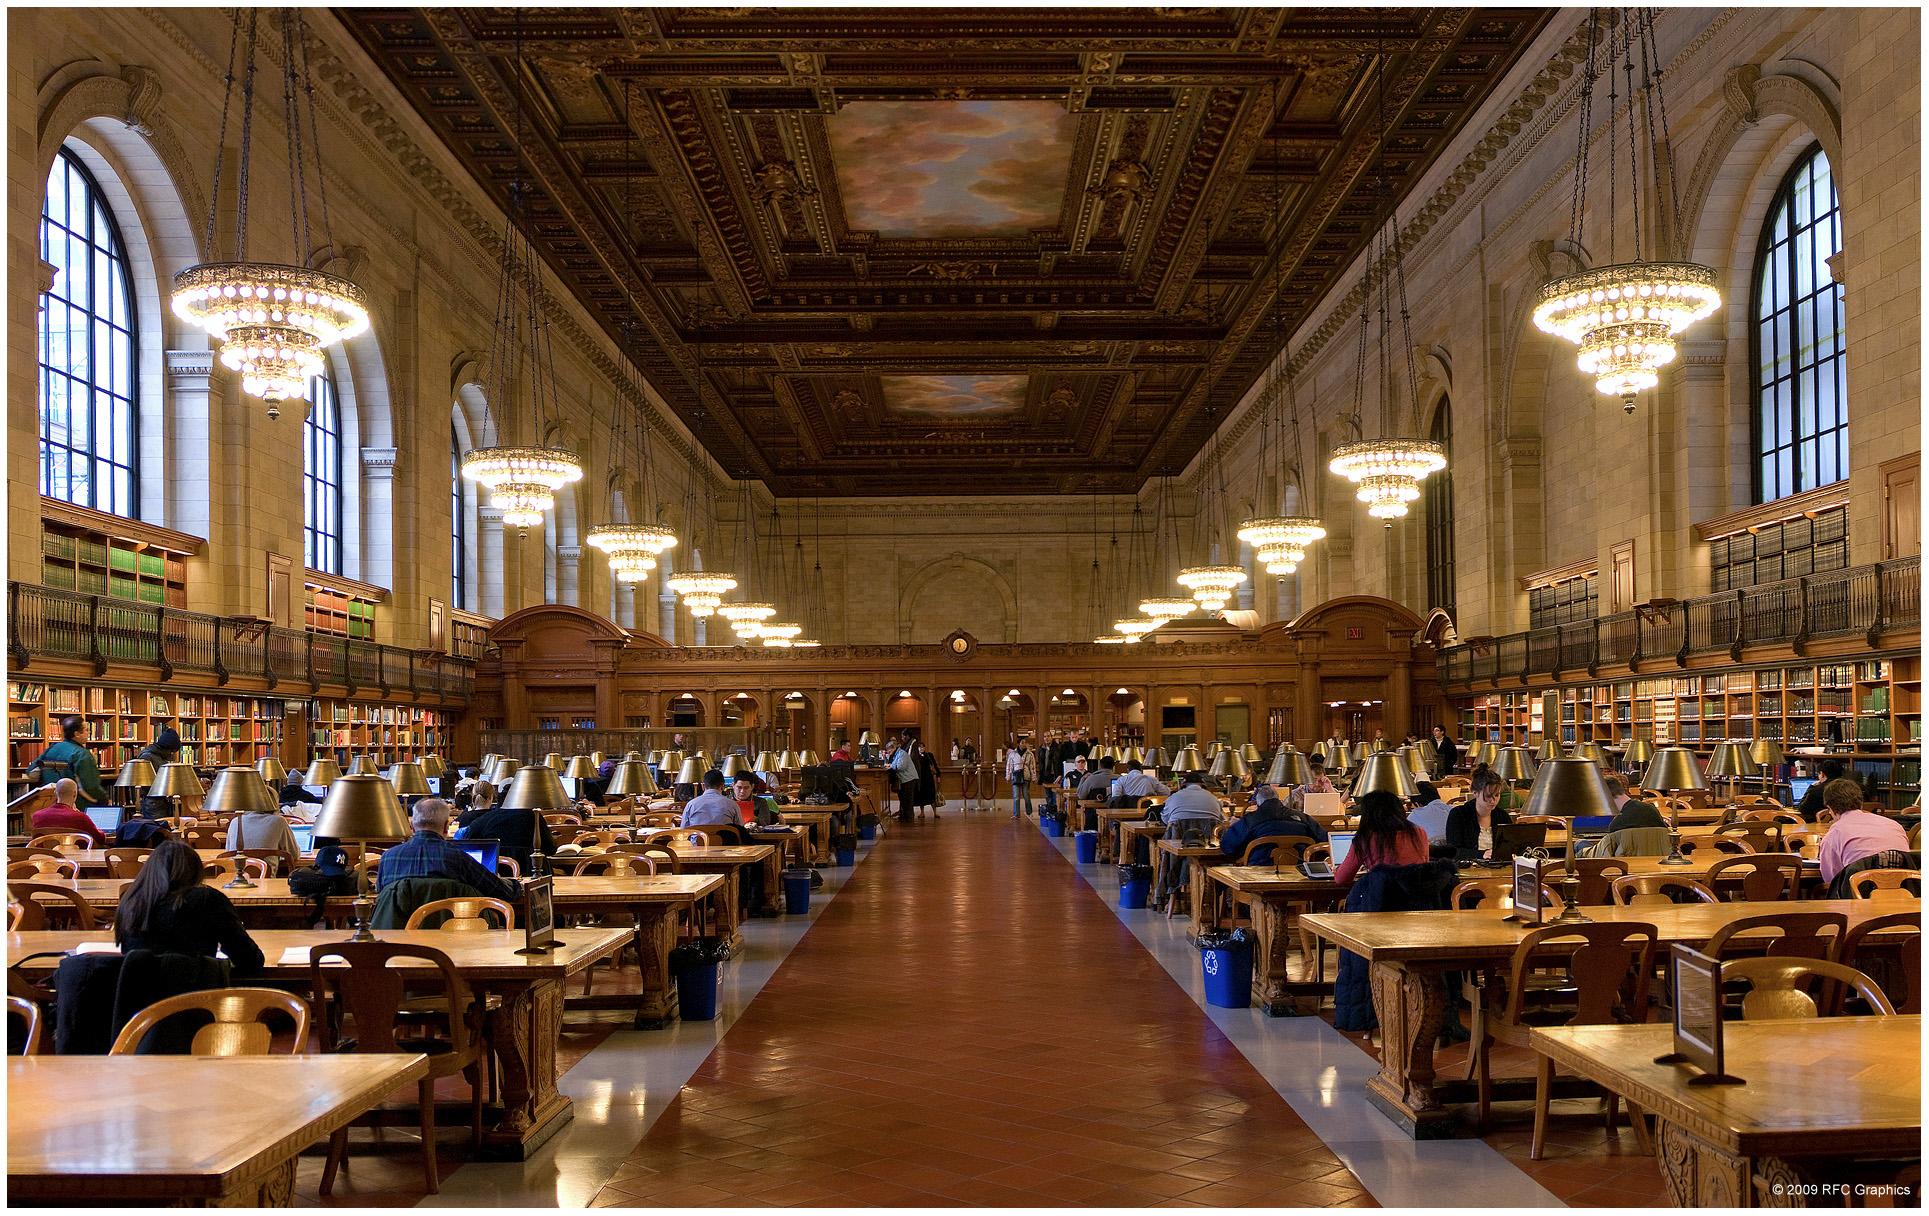 New York Public Library Reading Room Wallpaper